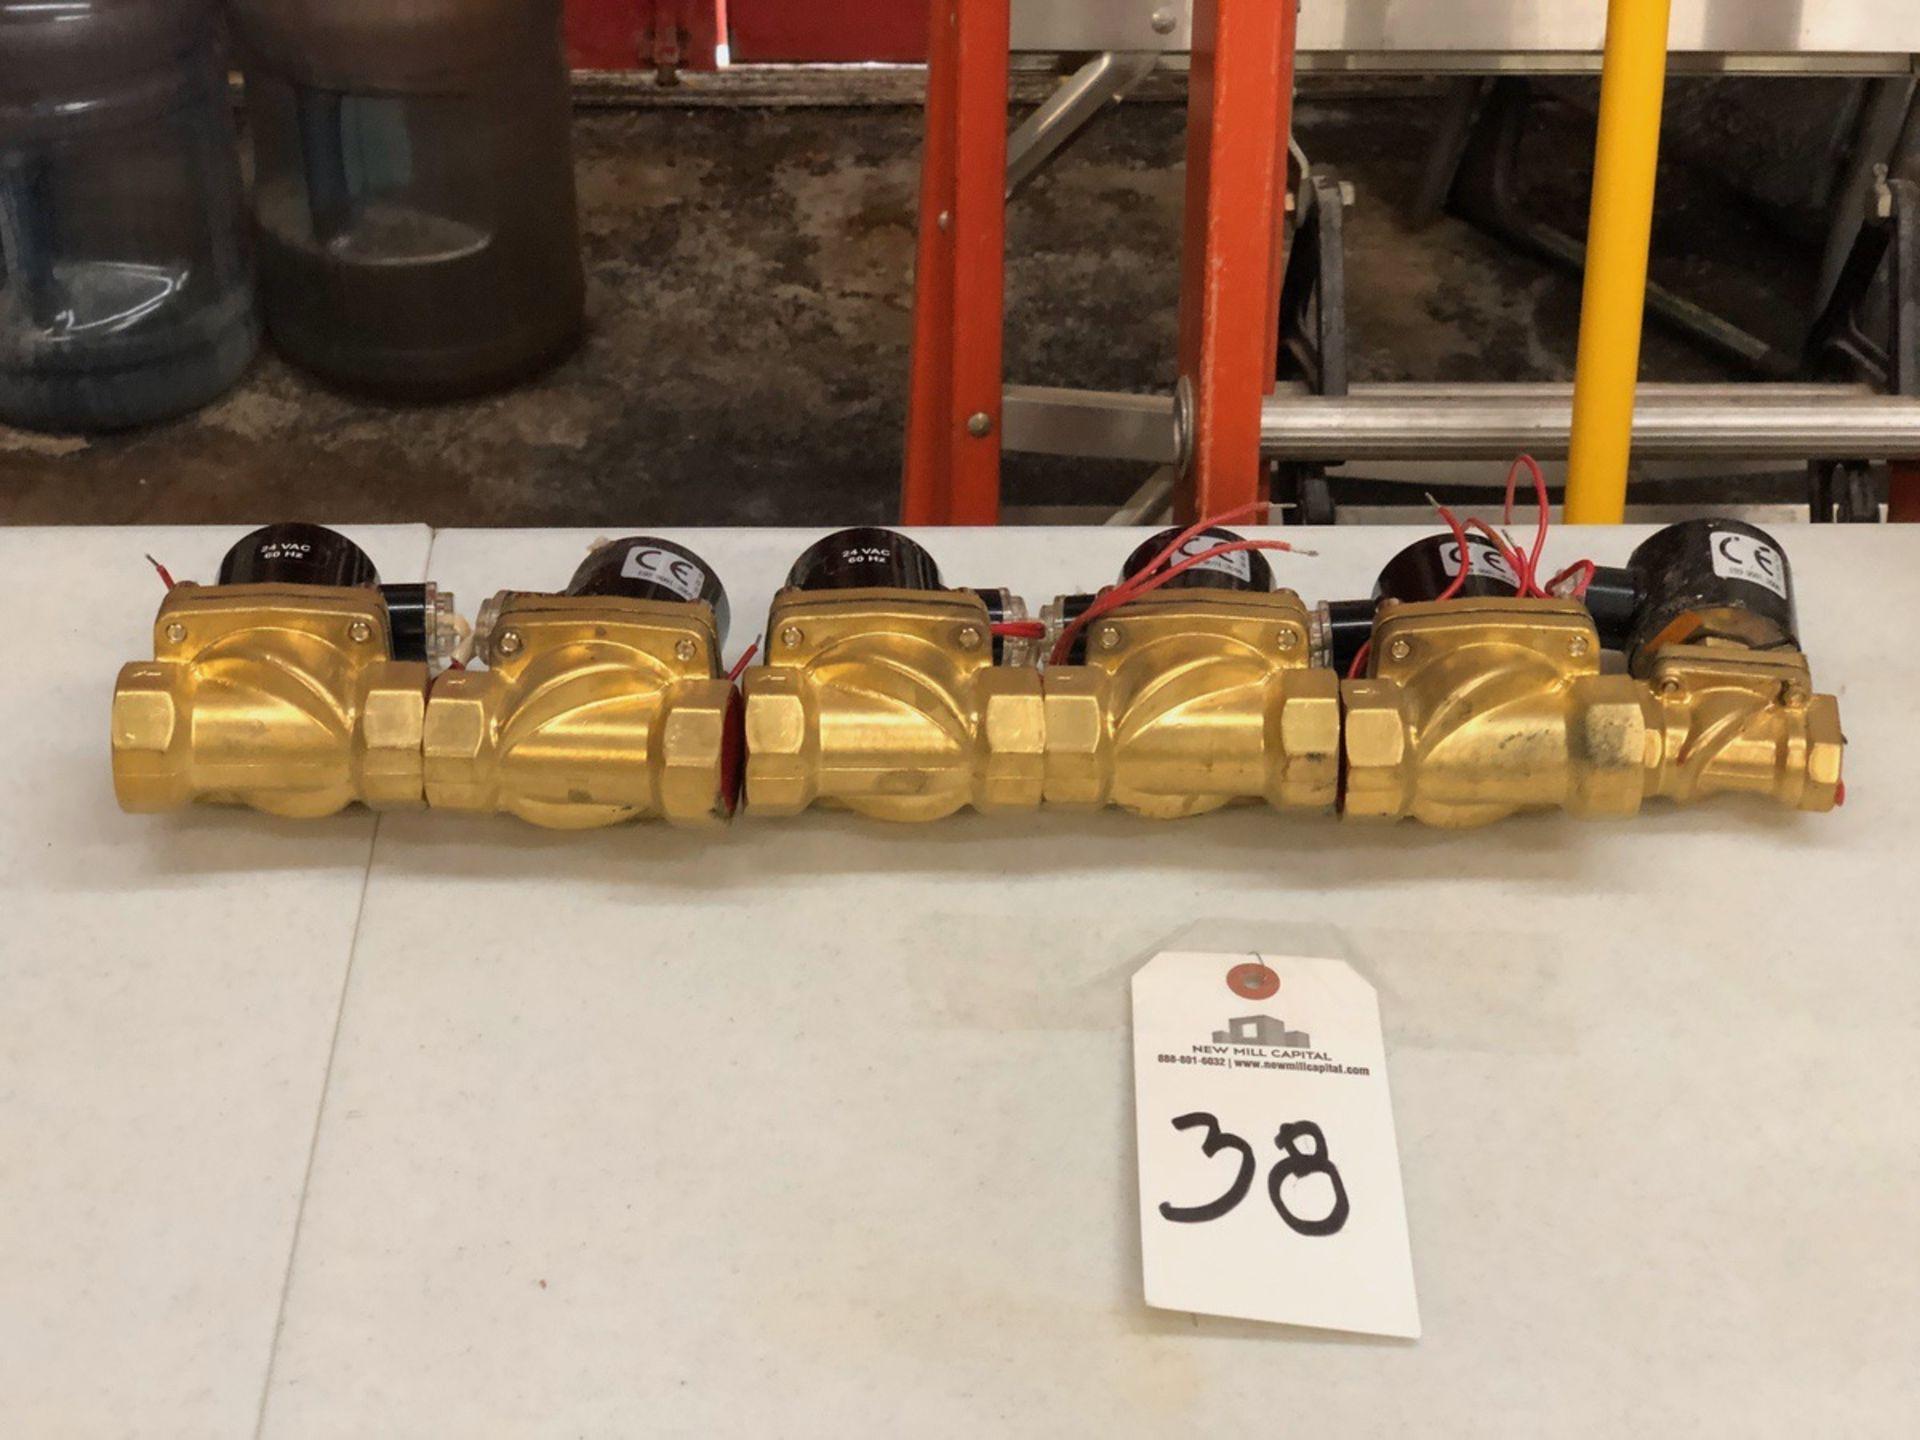 Lot 38 - Lot of (6) Solenoid Valves, 24v DC | Sub to Bulk | Rig Fee: $30 or HC